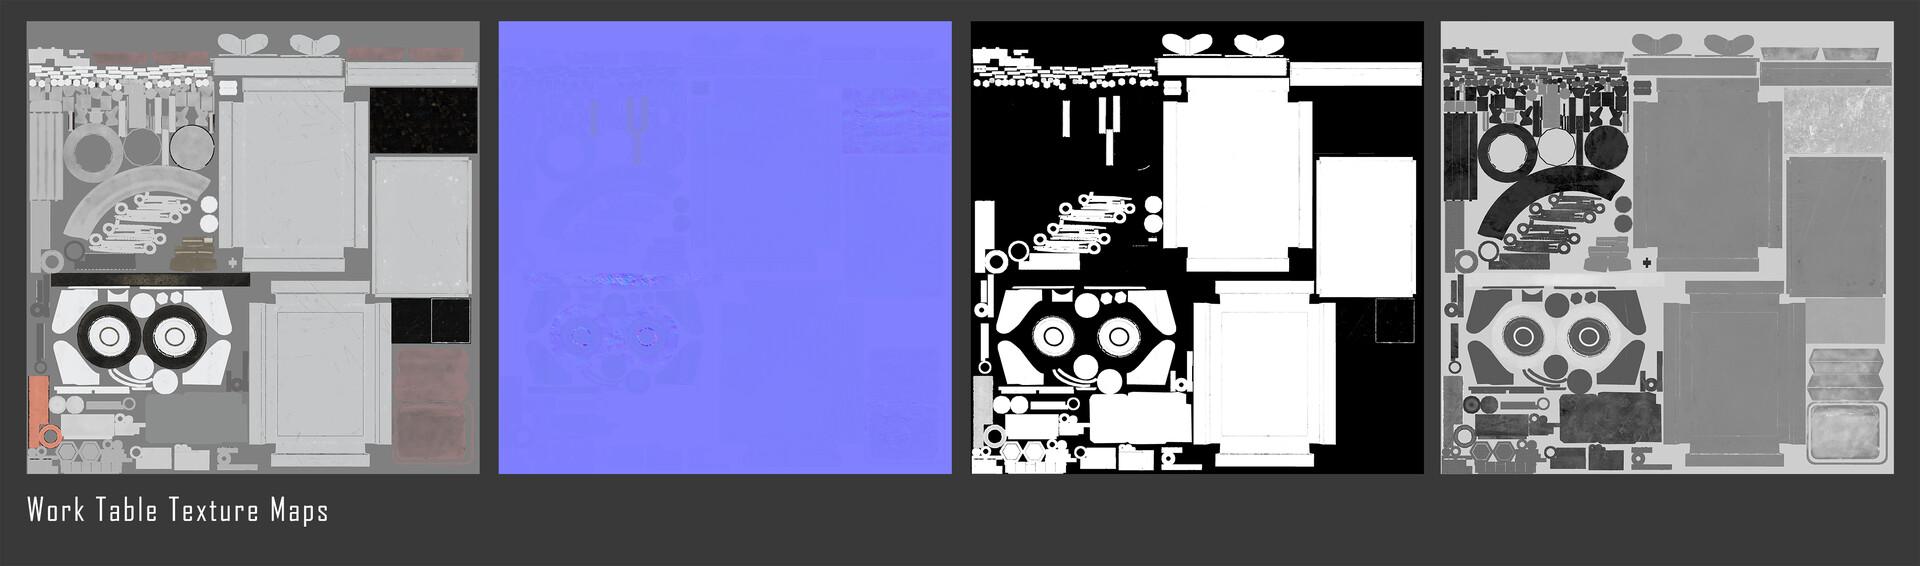 Sherif habashi worktable texturemaps